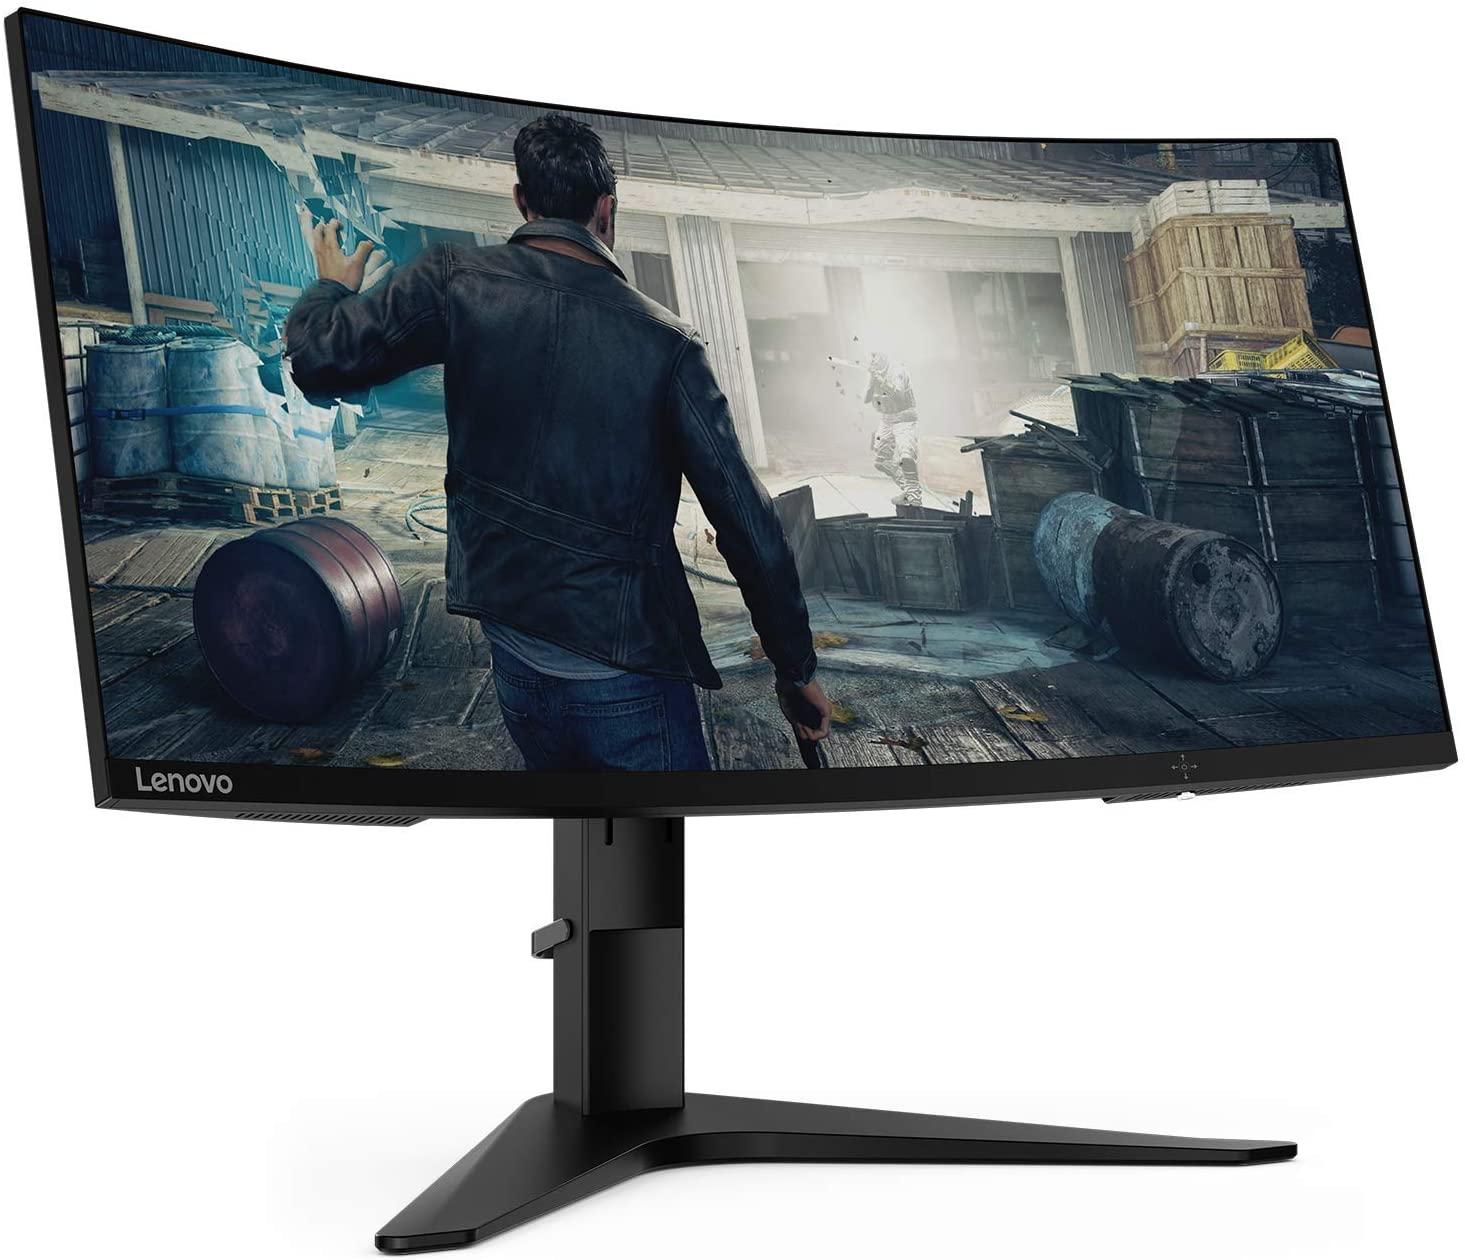 "Lenovo G34w-10 34"" Ultra Wide QHD Curved Monitor (3440x1440, QHD, 144Hz, Anti-glare, 4ms, AMD FreeSync) - £363.41 delivered @ Amazon Germany"